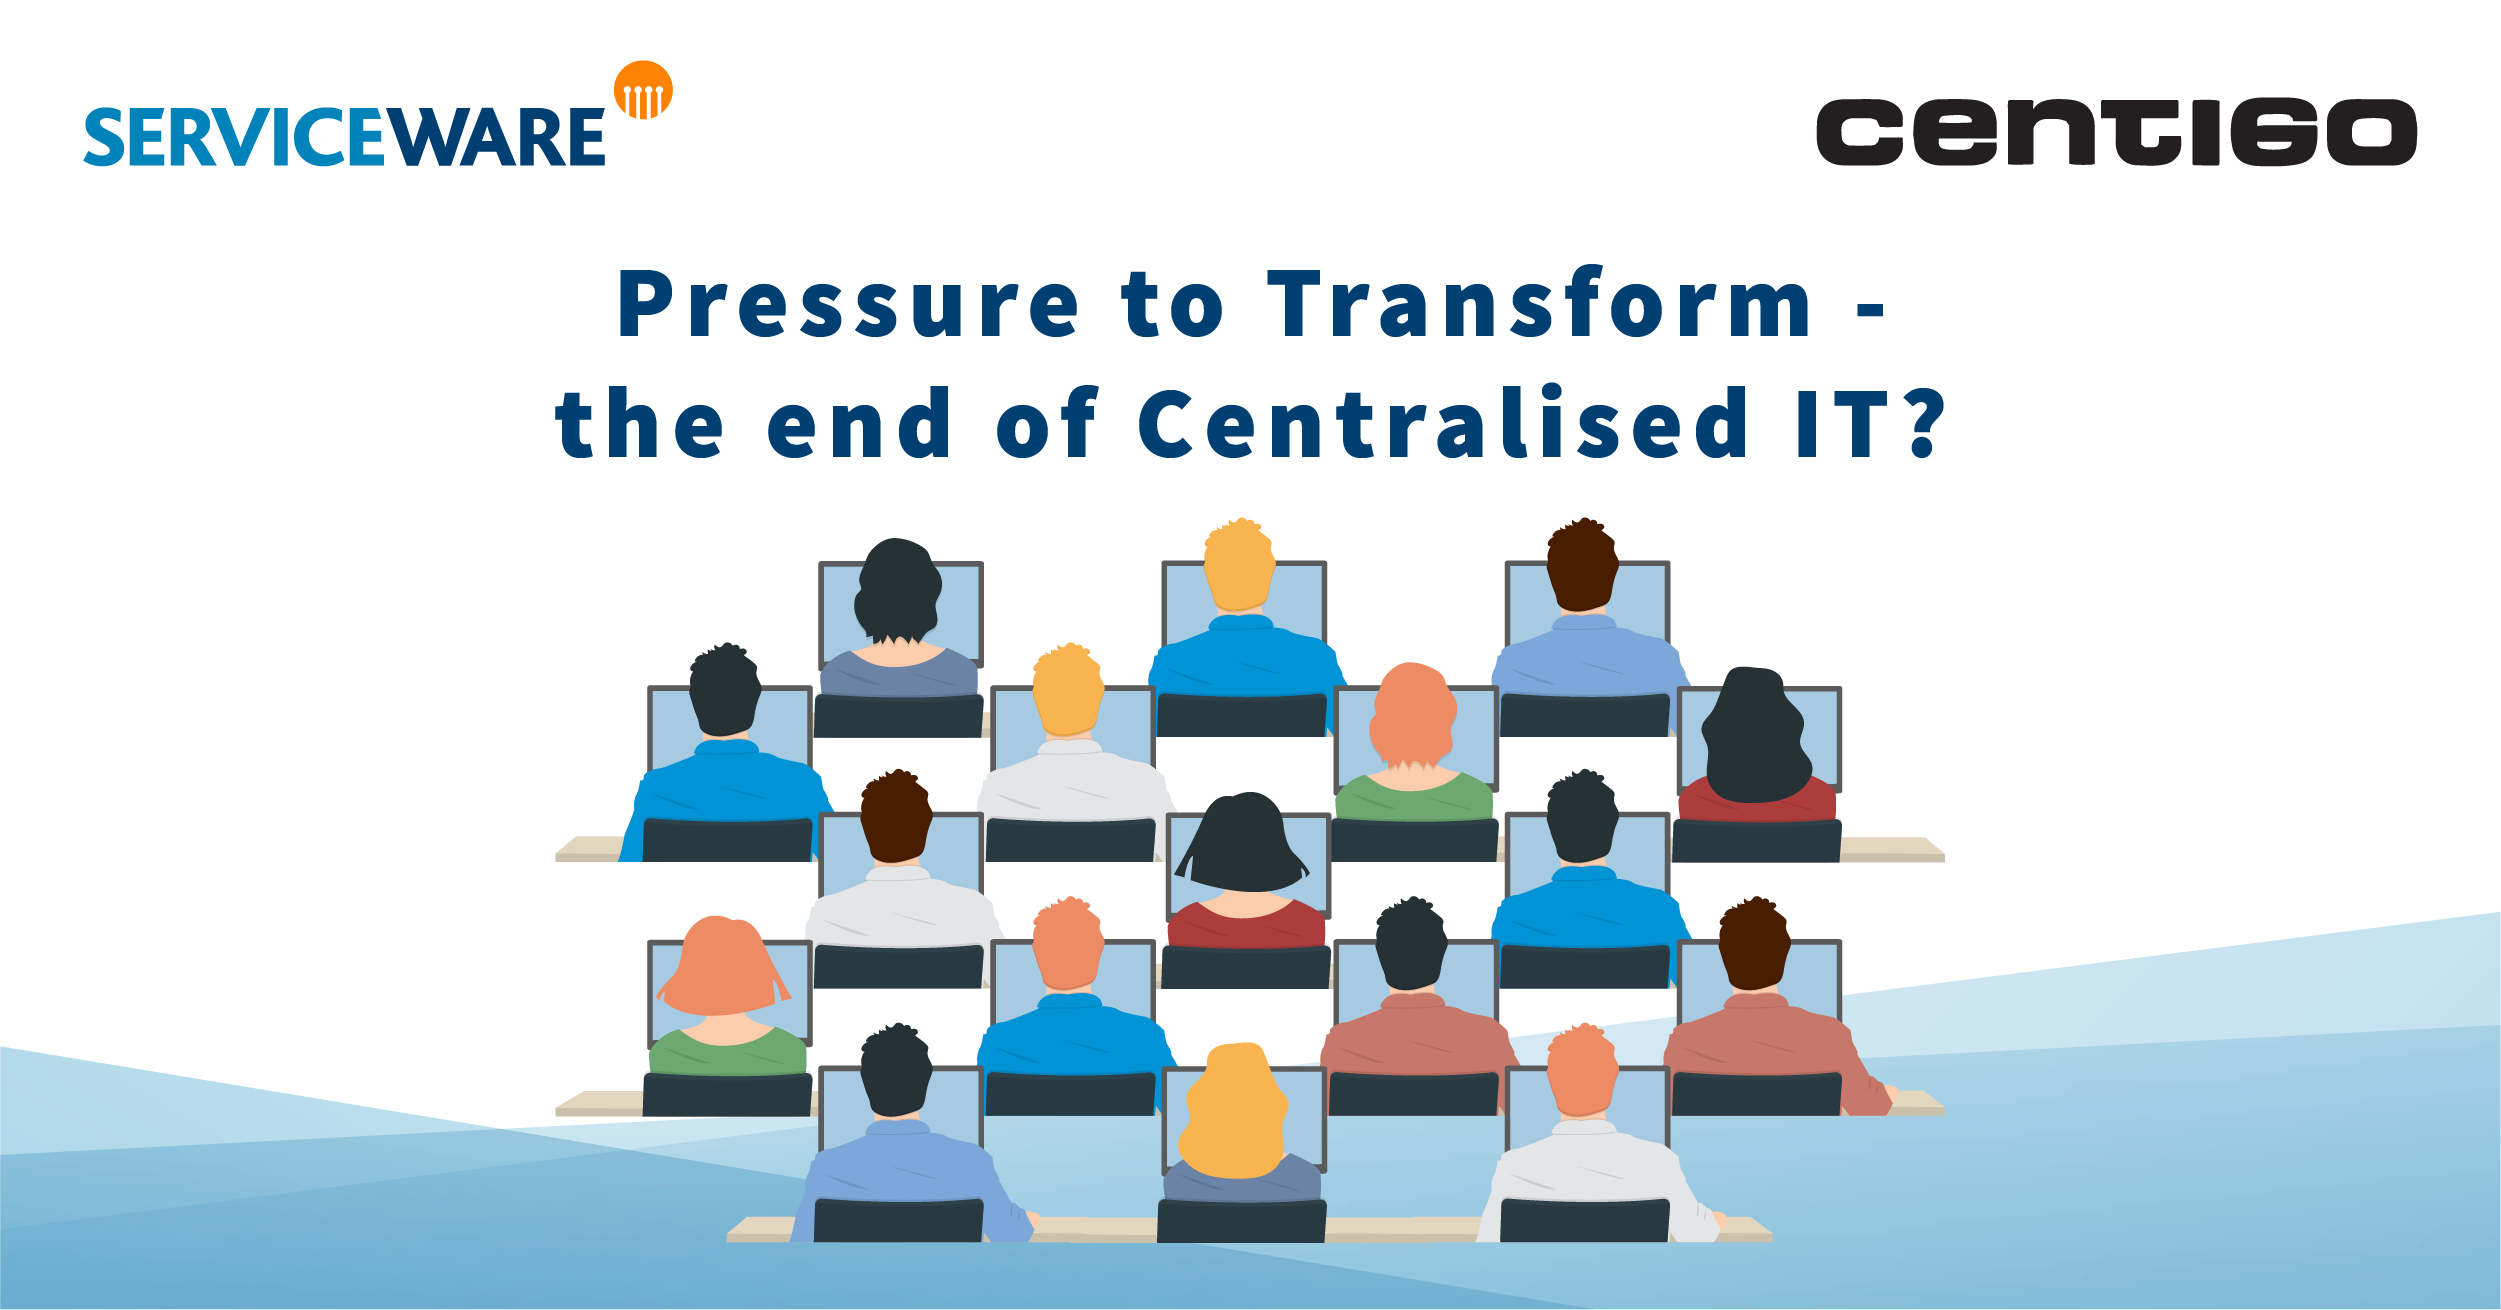 Centralised, decentralised or hybrid IT?